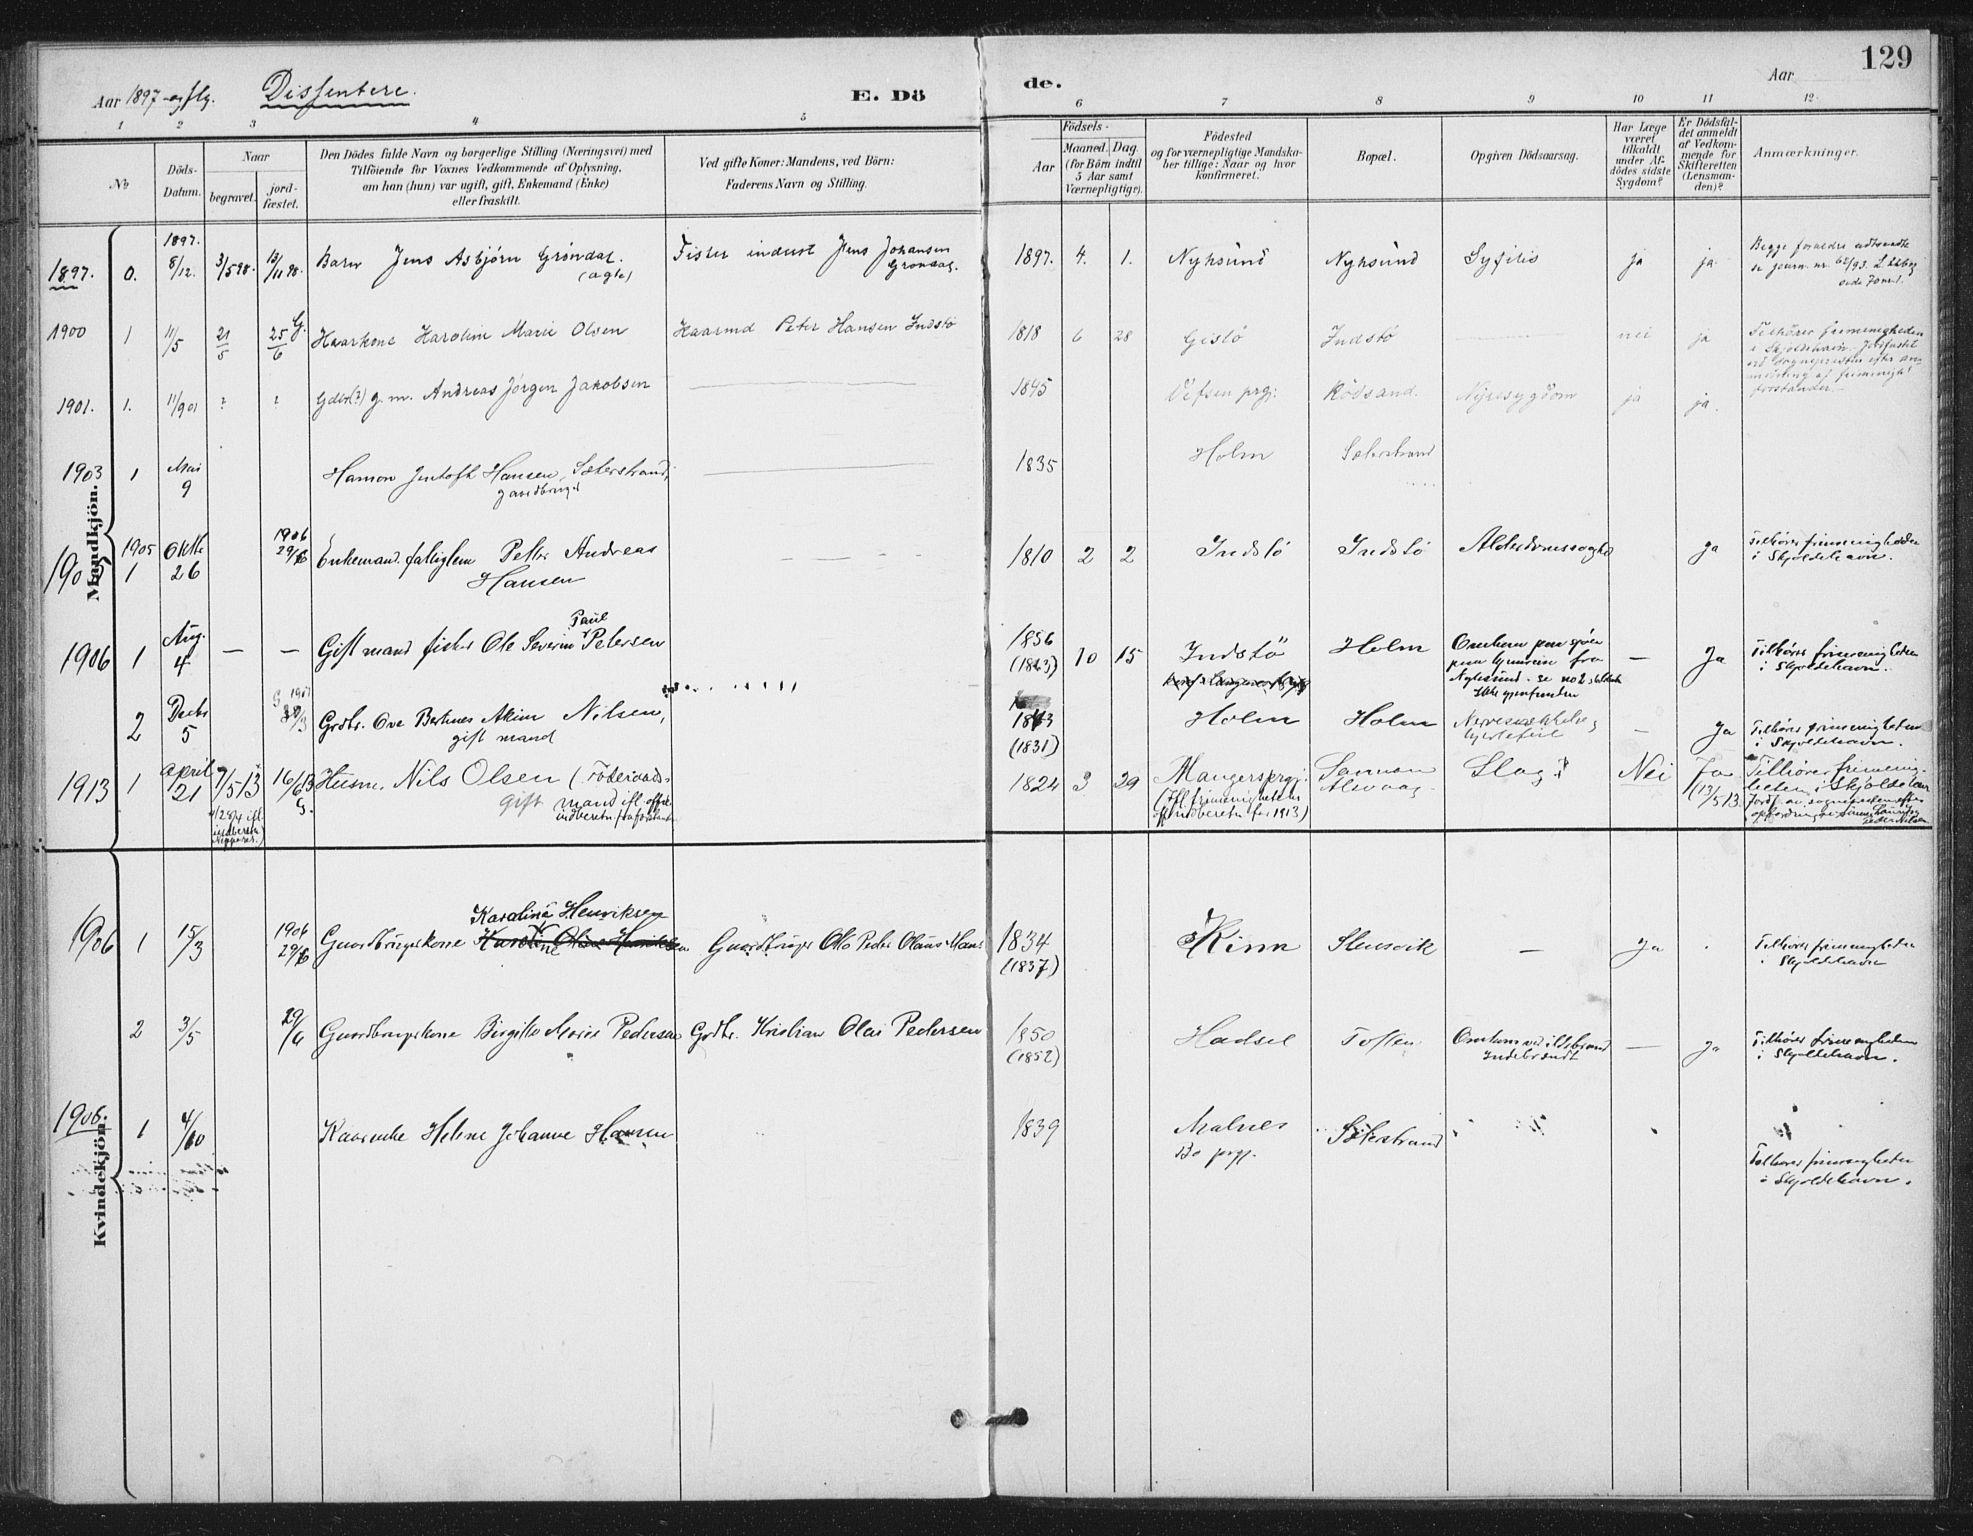 SAT, Ministerialprotokoller, klokkerbøker og fødselsregistre - Nordland, 894/L1356: Ministerialbok nr. 894A02, 1897-1914, s. 129